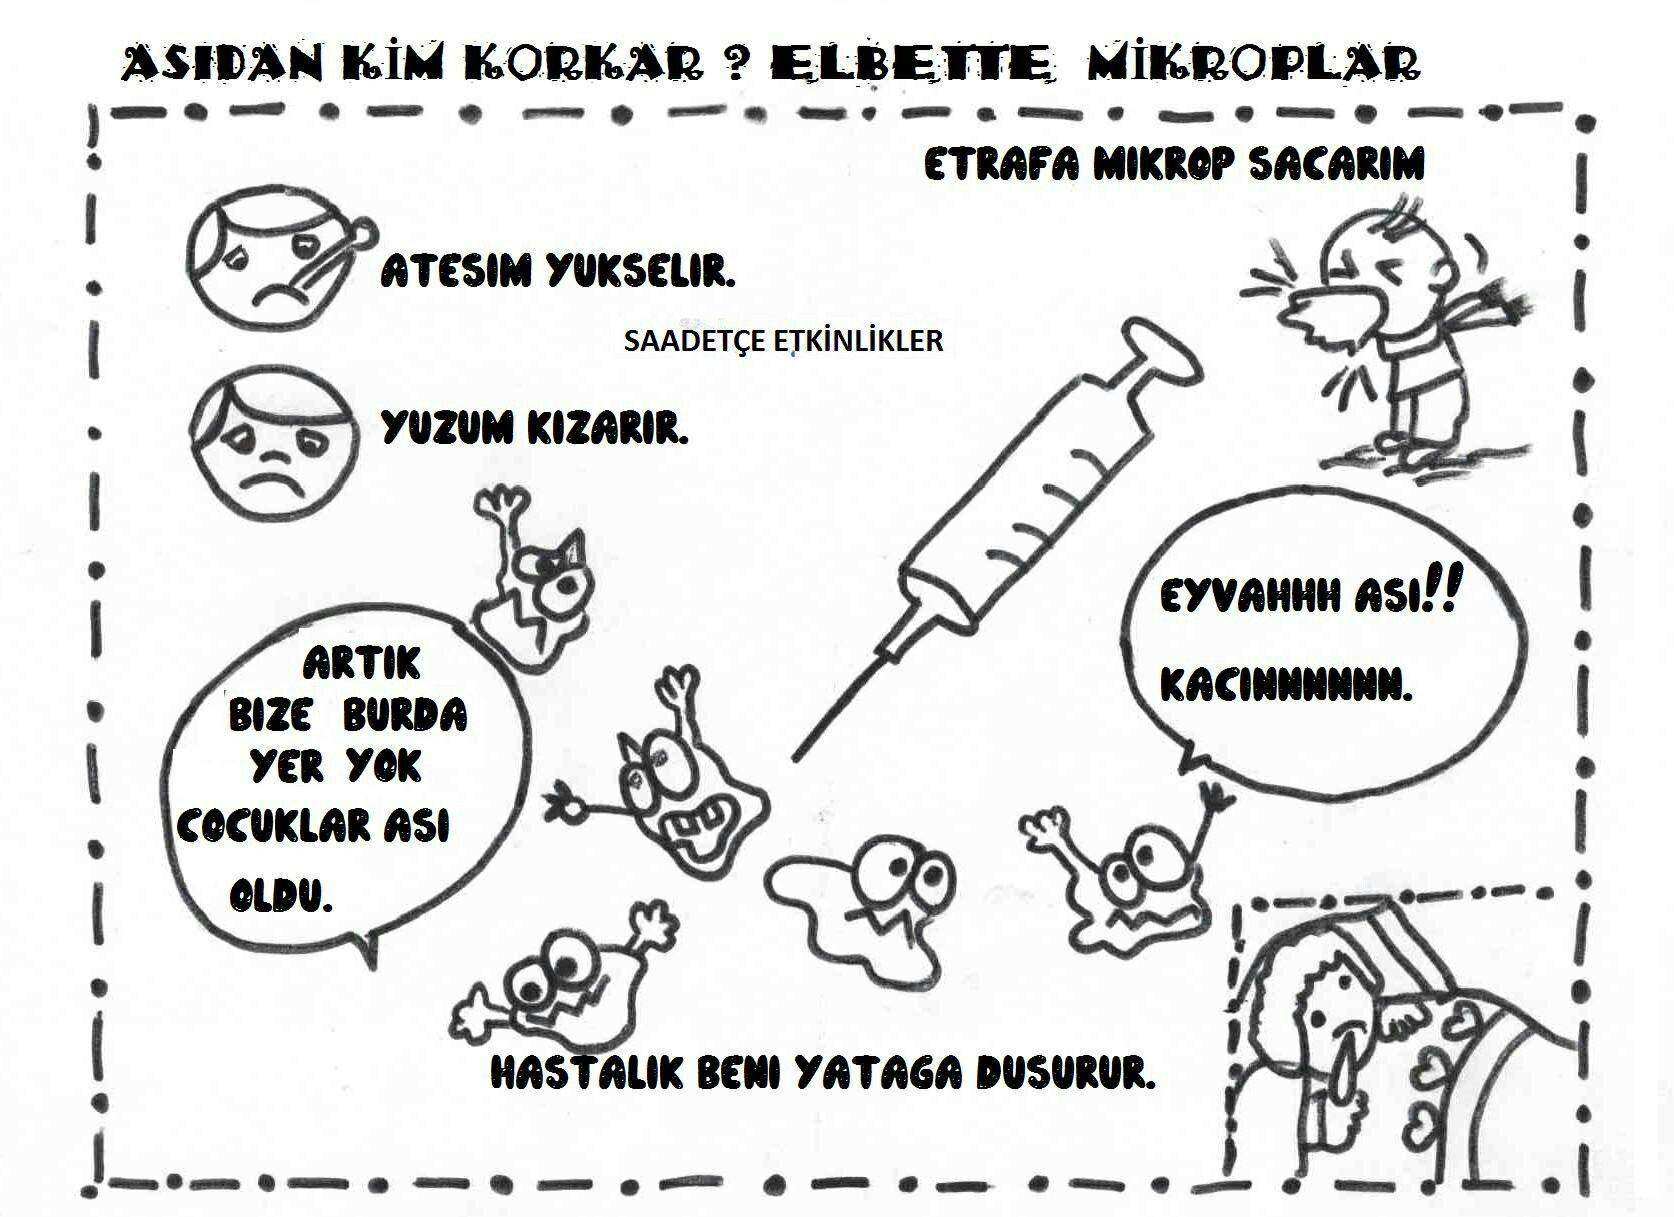 Ebru Koroglu Adli Kullanicinin Saglik Panosundaki Pin